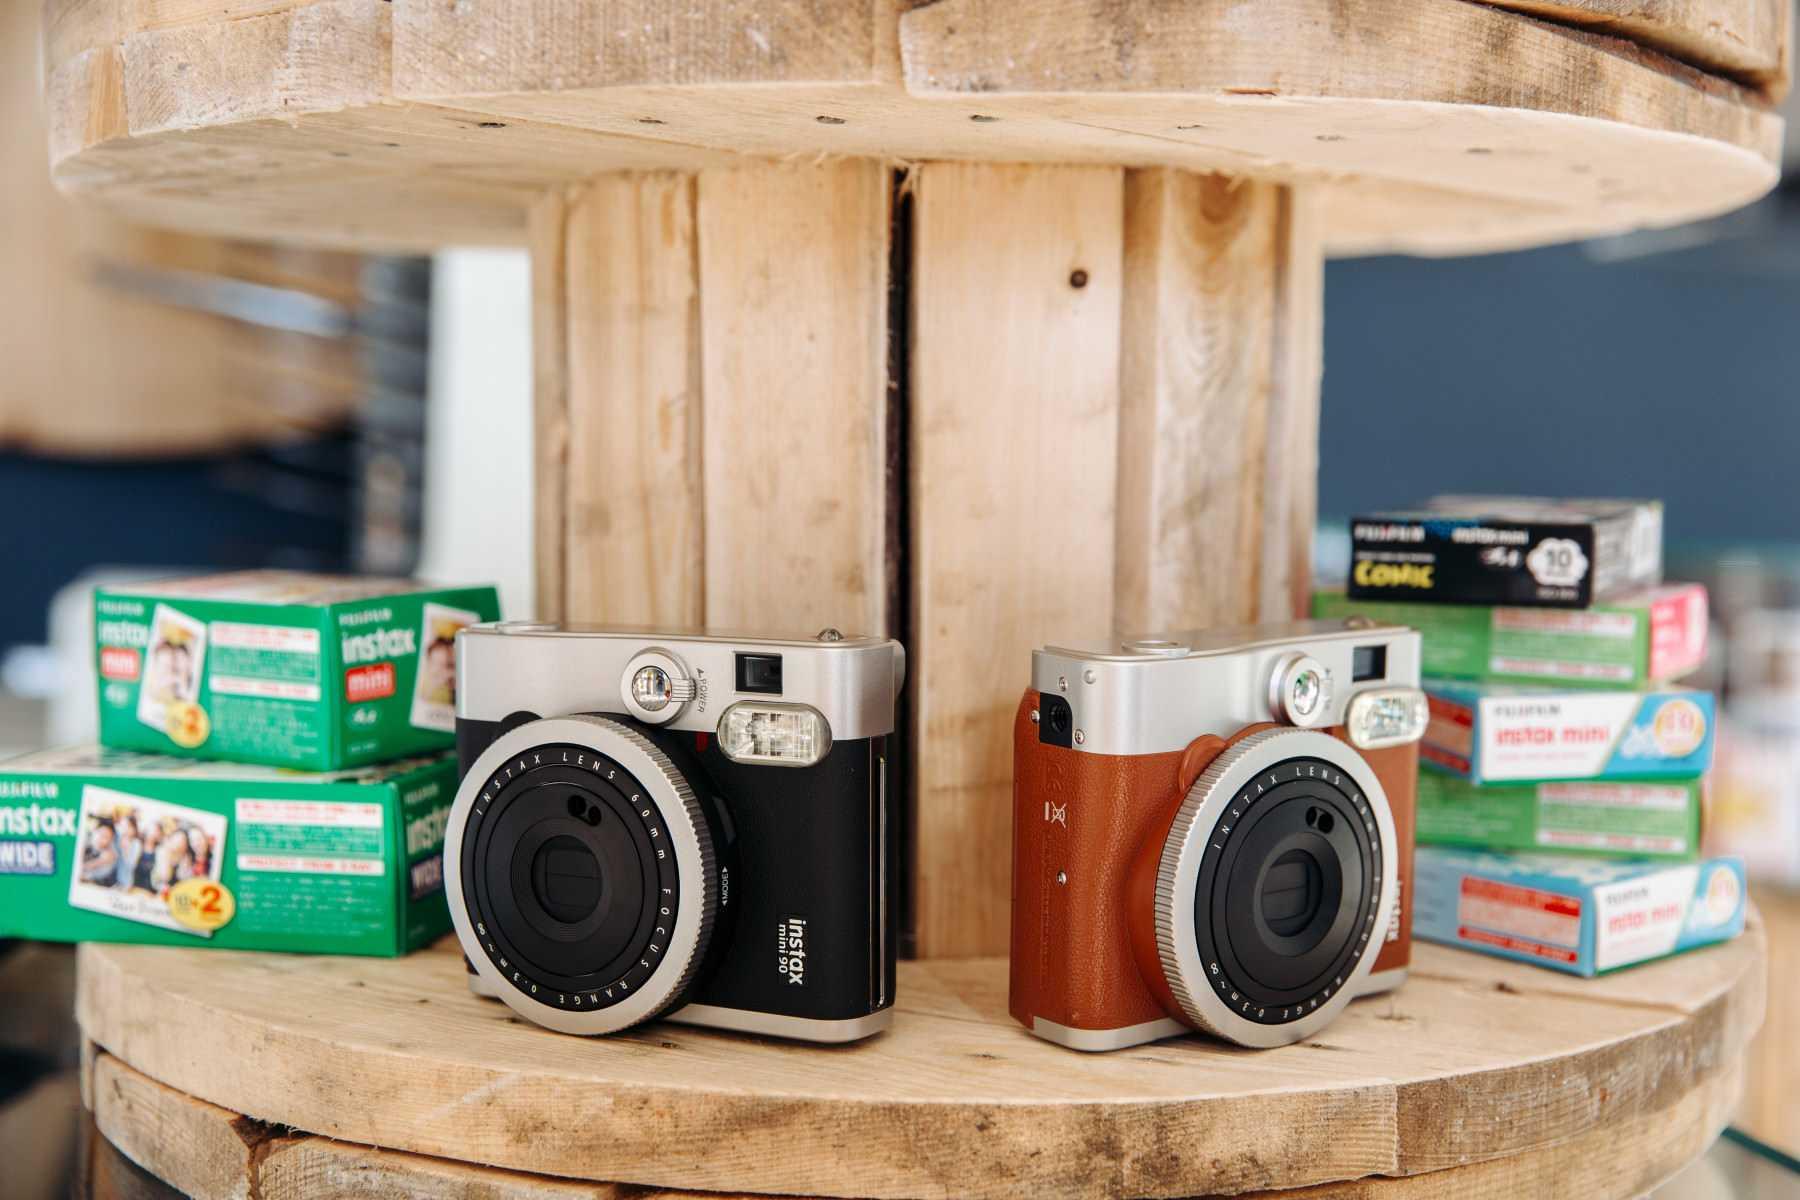 Fujifilm выпускает x raw studio и обновляет прошивки камер x-t2, x-t20 и gfx 50s